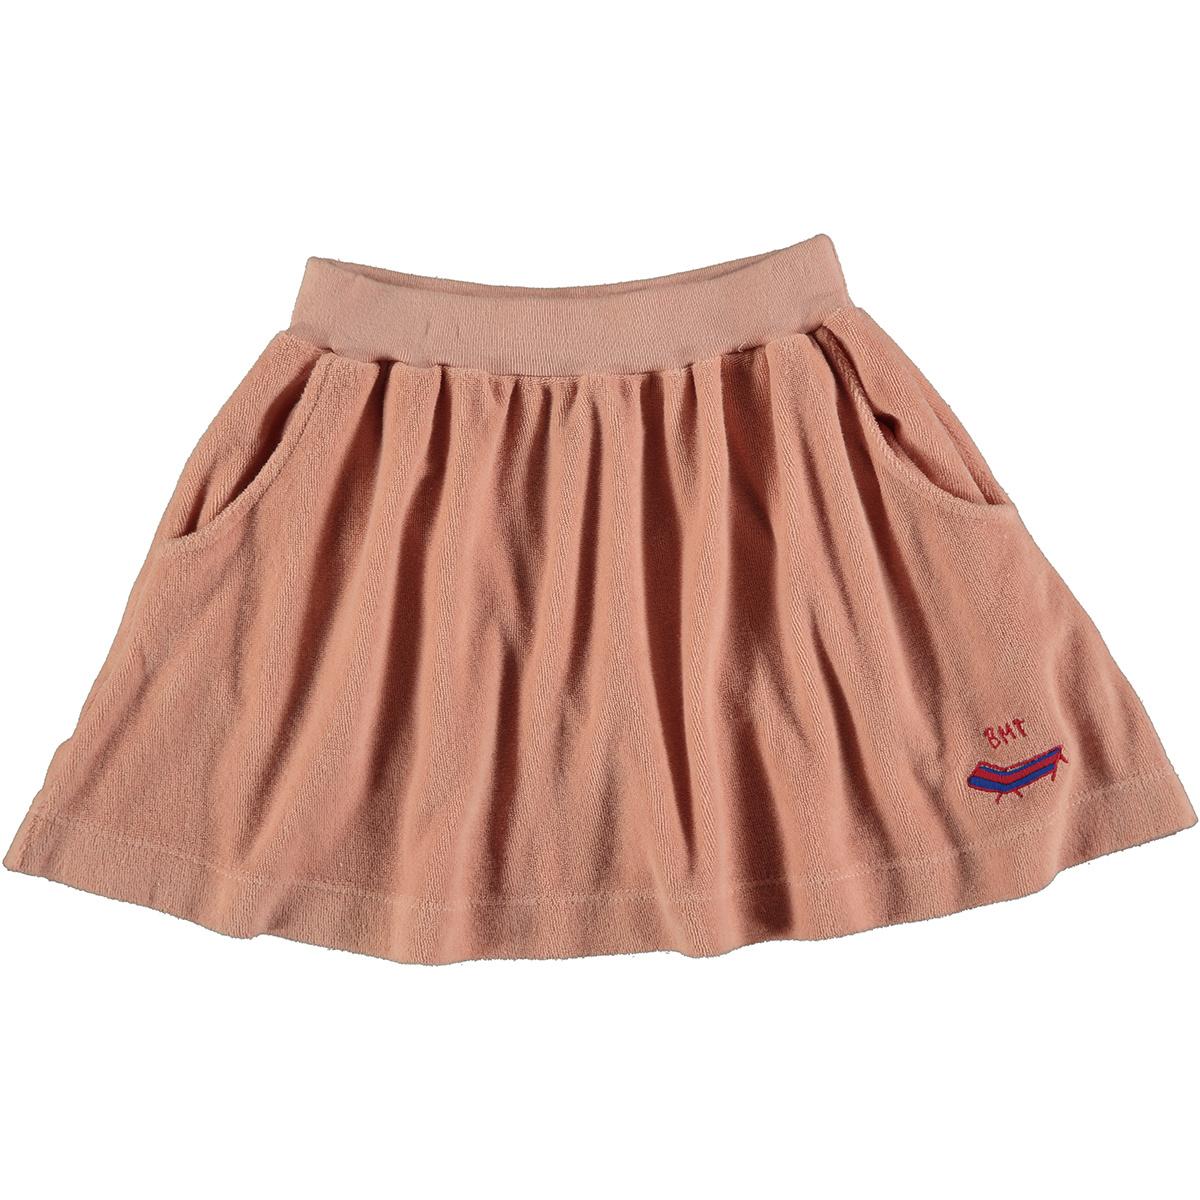 Skirt kid Sunbed - Dusty Pink-1